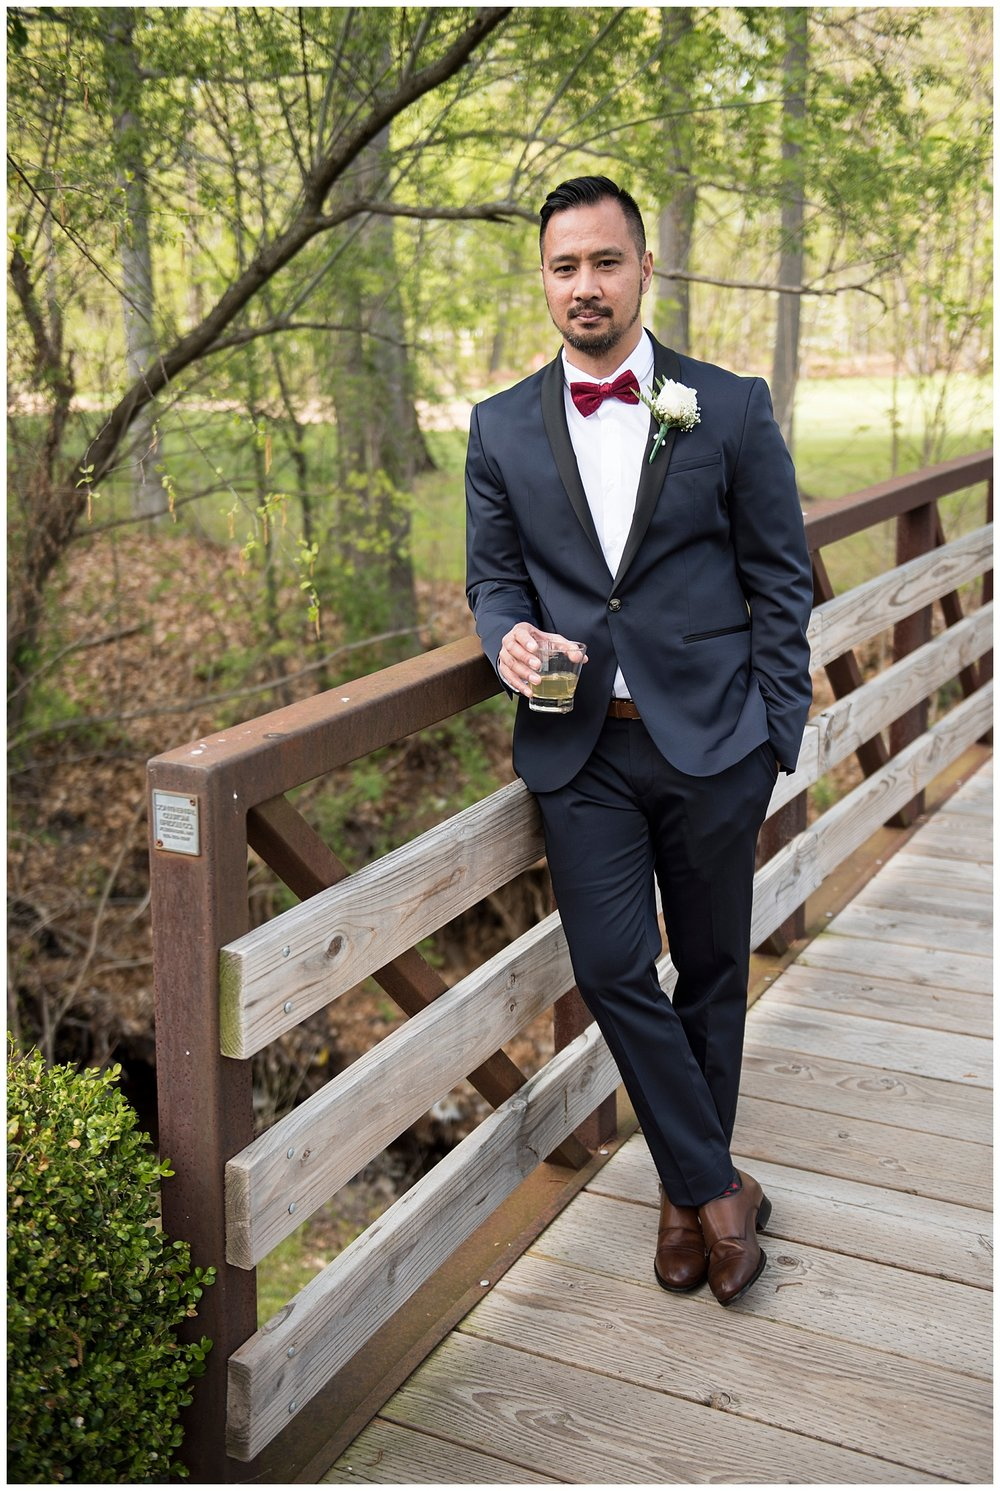 Classy Groom   Intimate Wedding Photographer   New York State Wedding Photographer   Farm Wedding Photographer   Apollo Fields Wedding Photojournalism